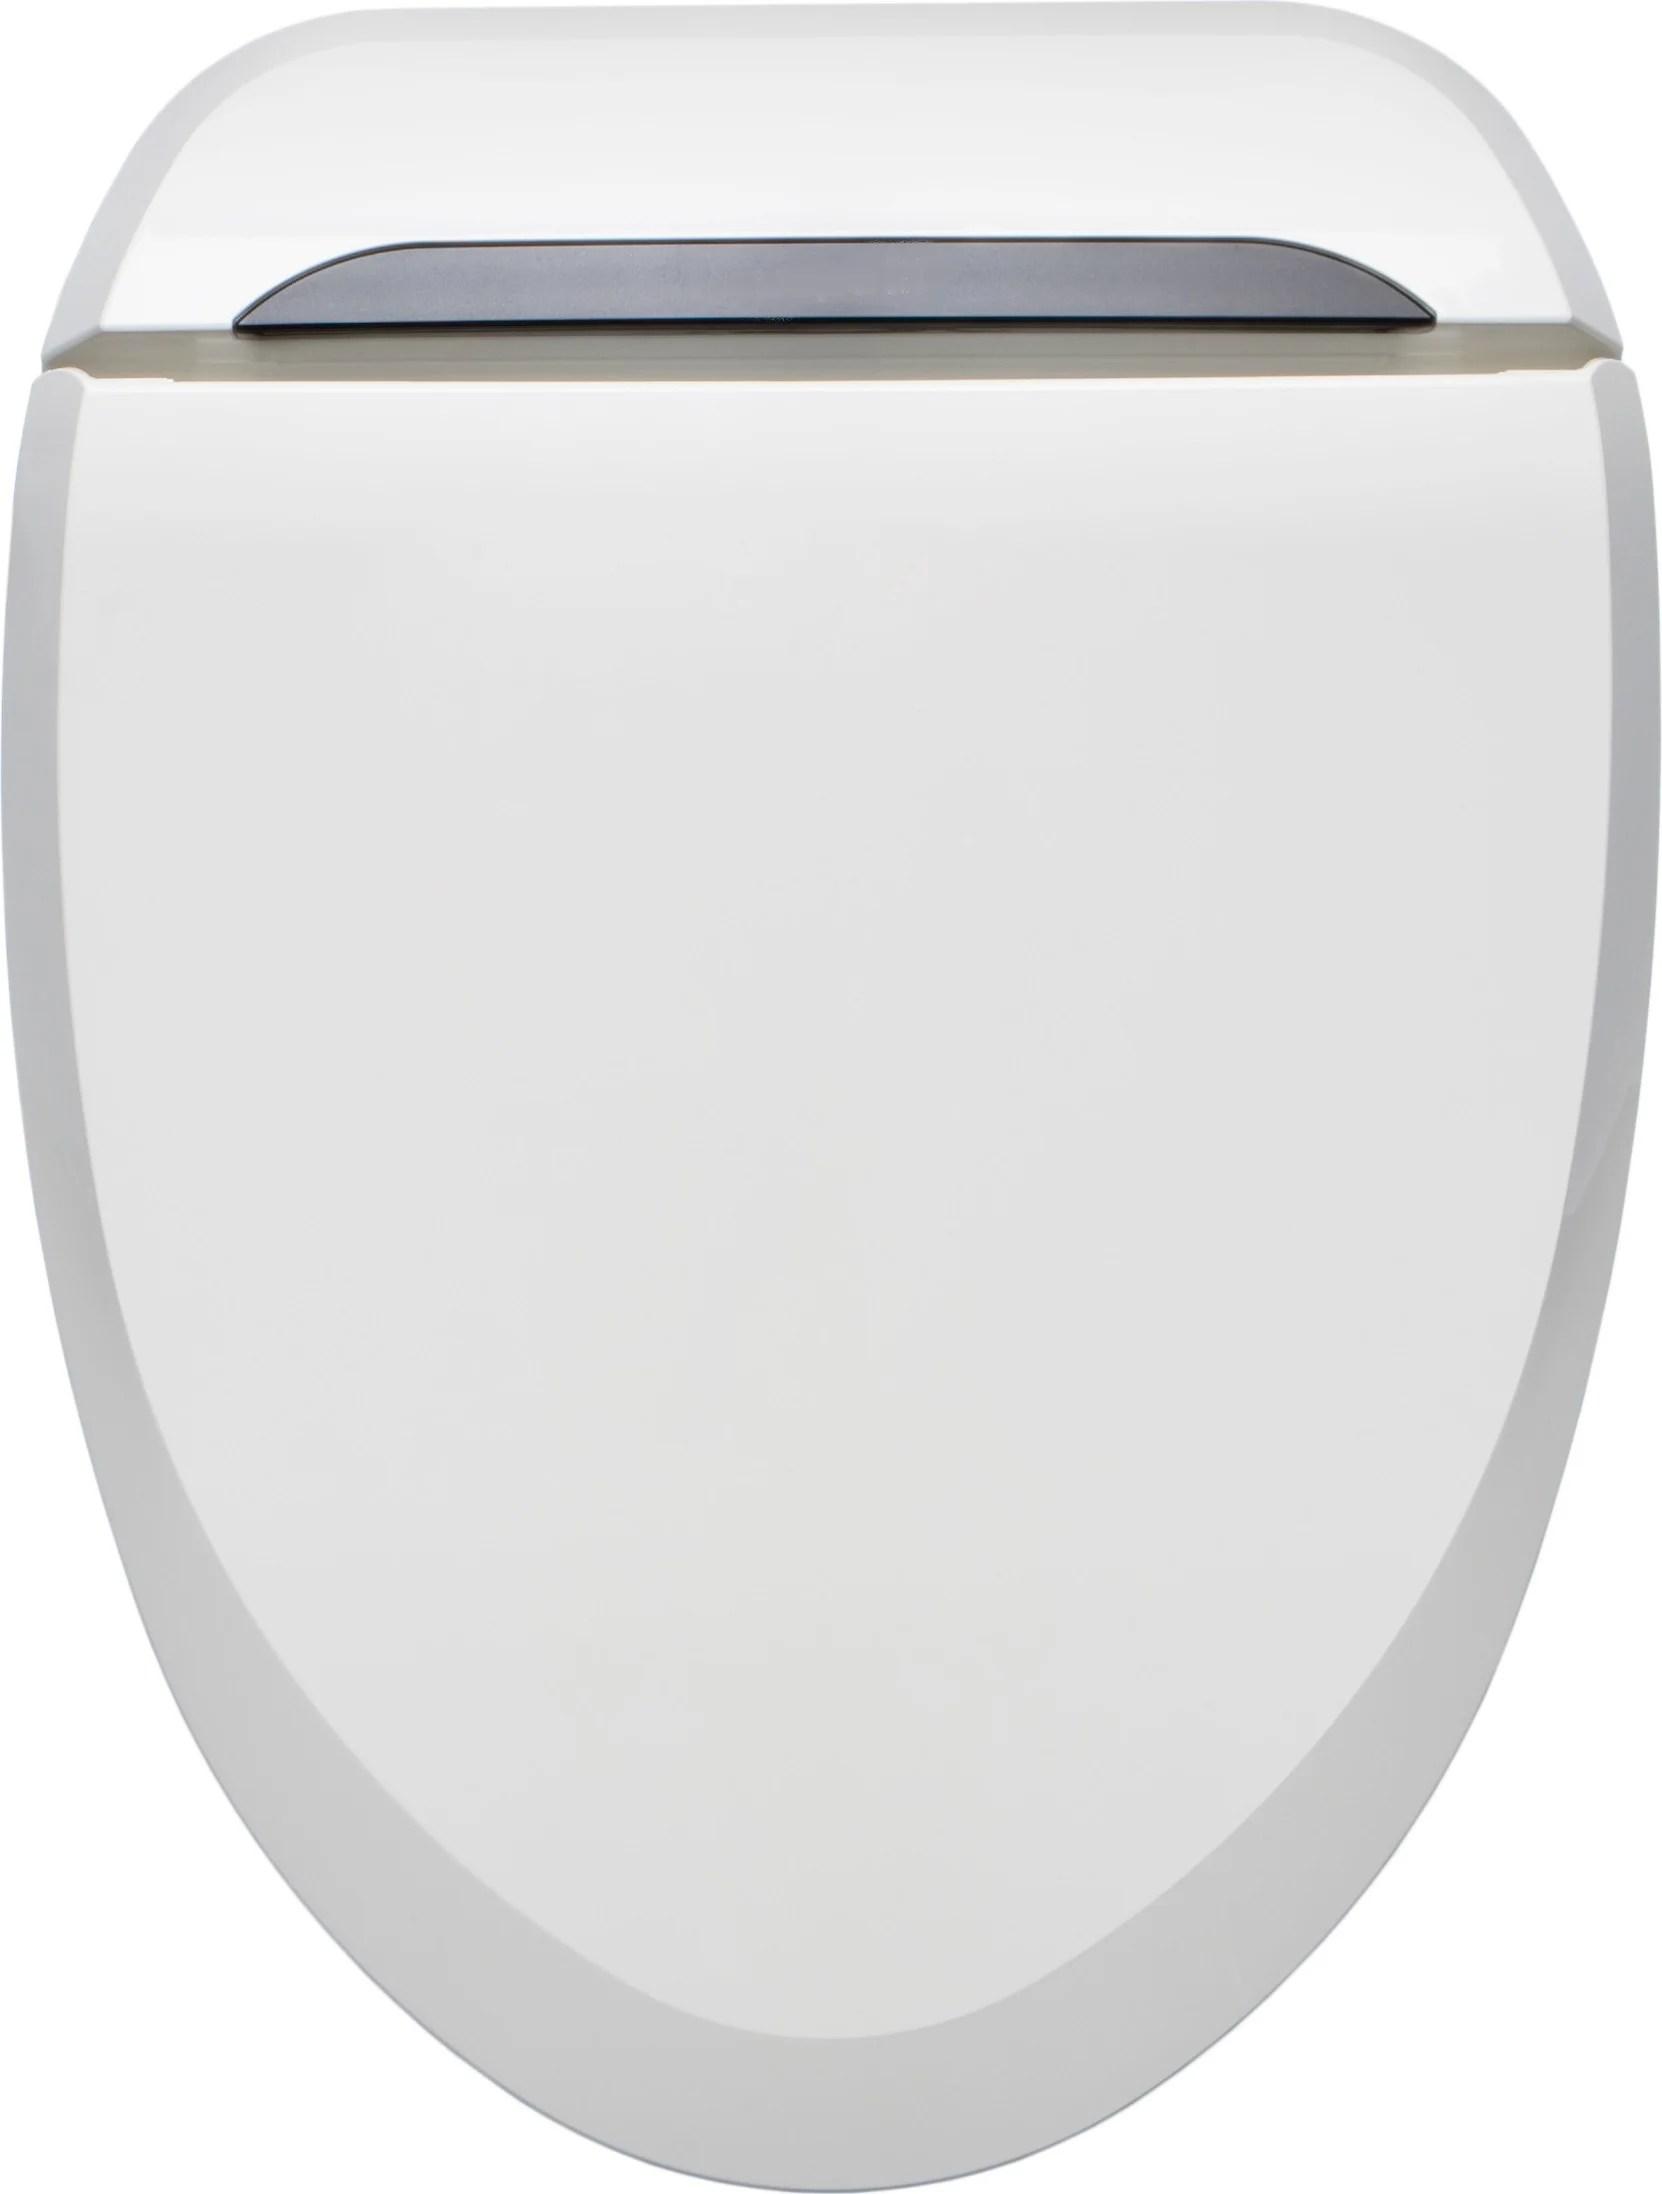 Leksikon Obratno Povikvane Nyakde Lunette Toilette Leroy Merlin Mfozkan Com